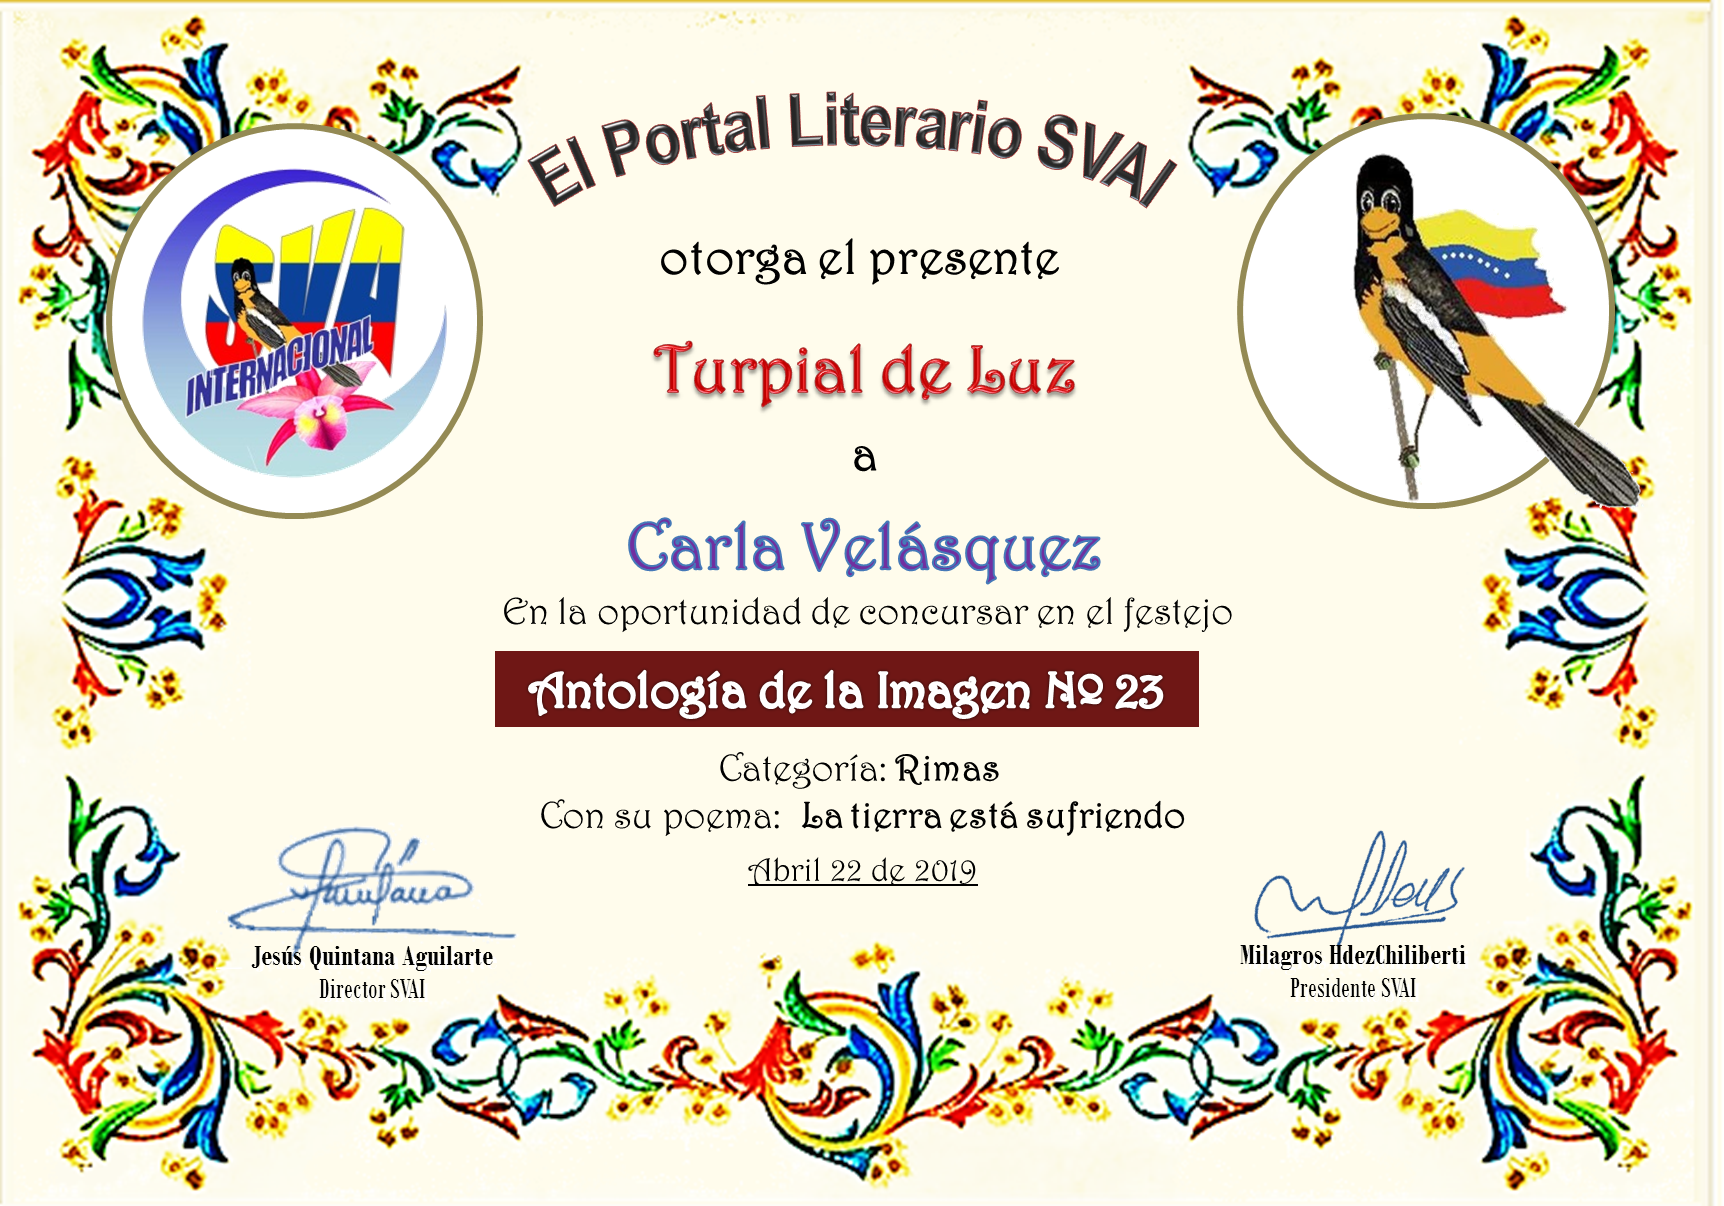 CARLA VELÁSQUEZ